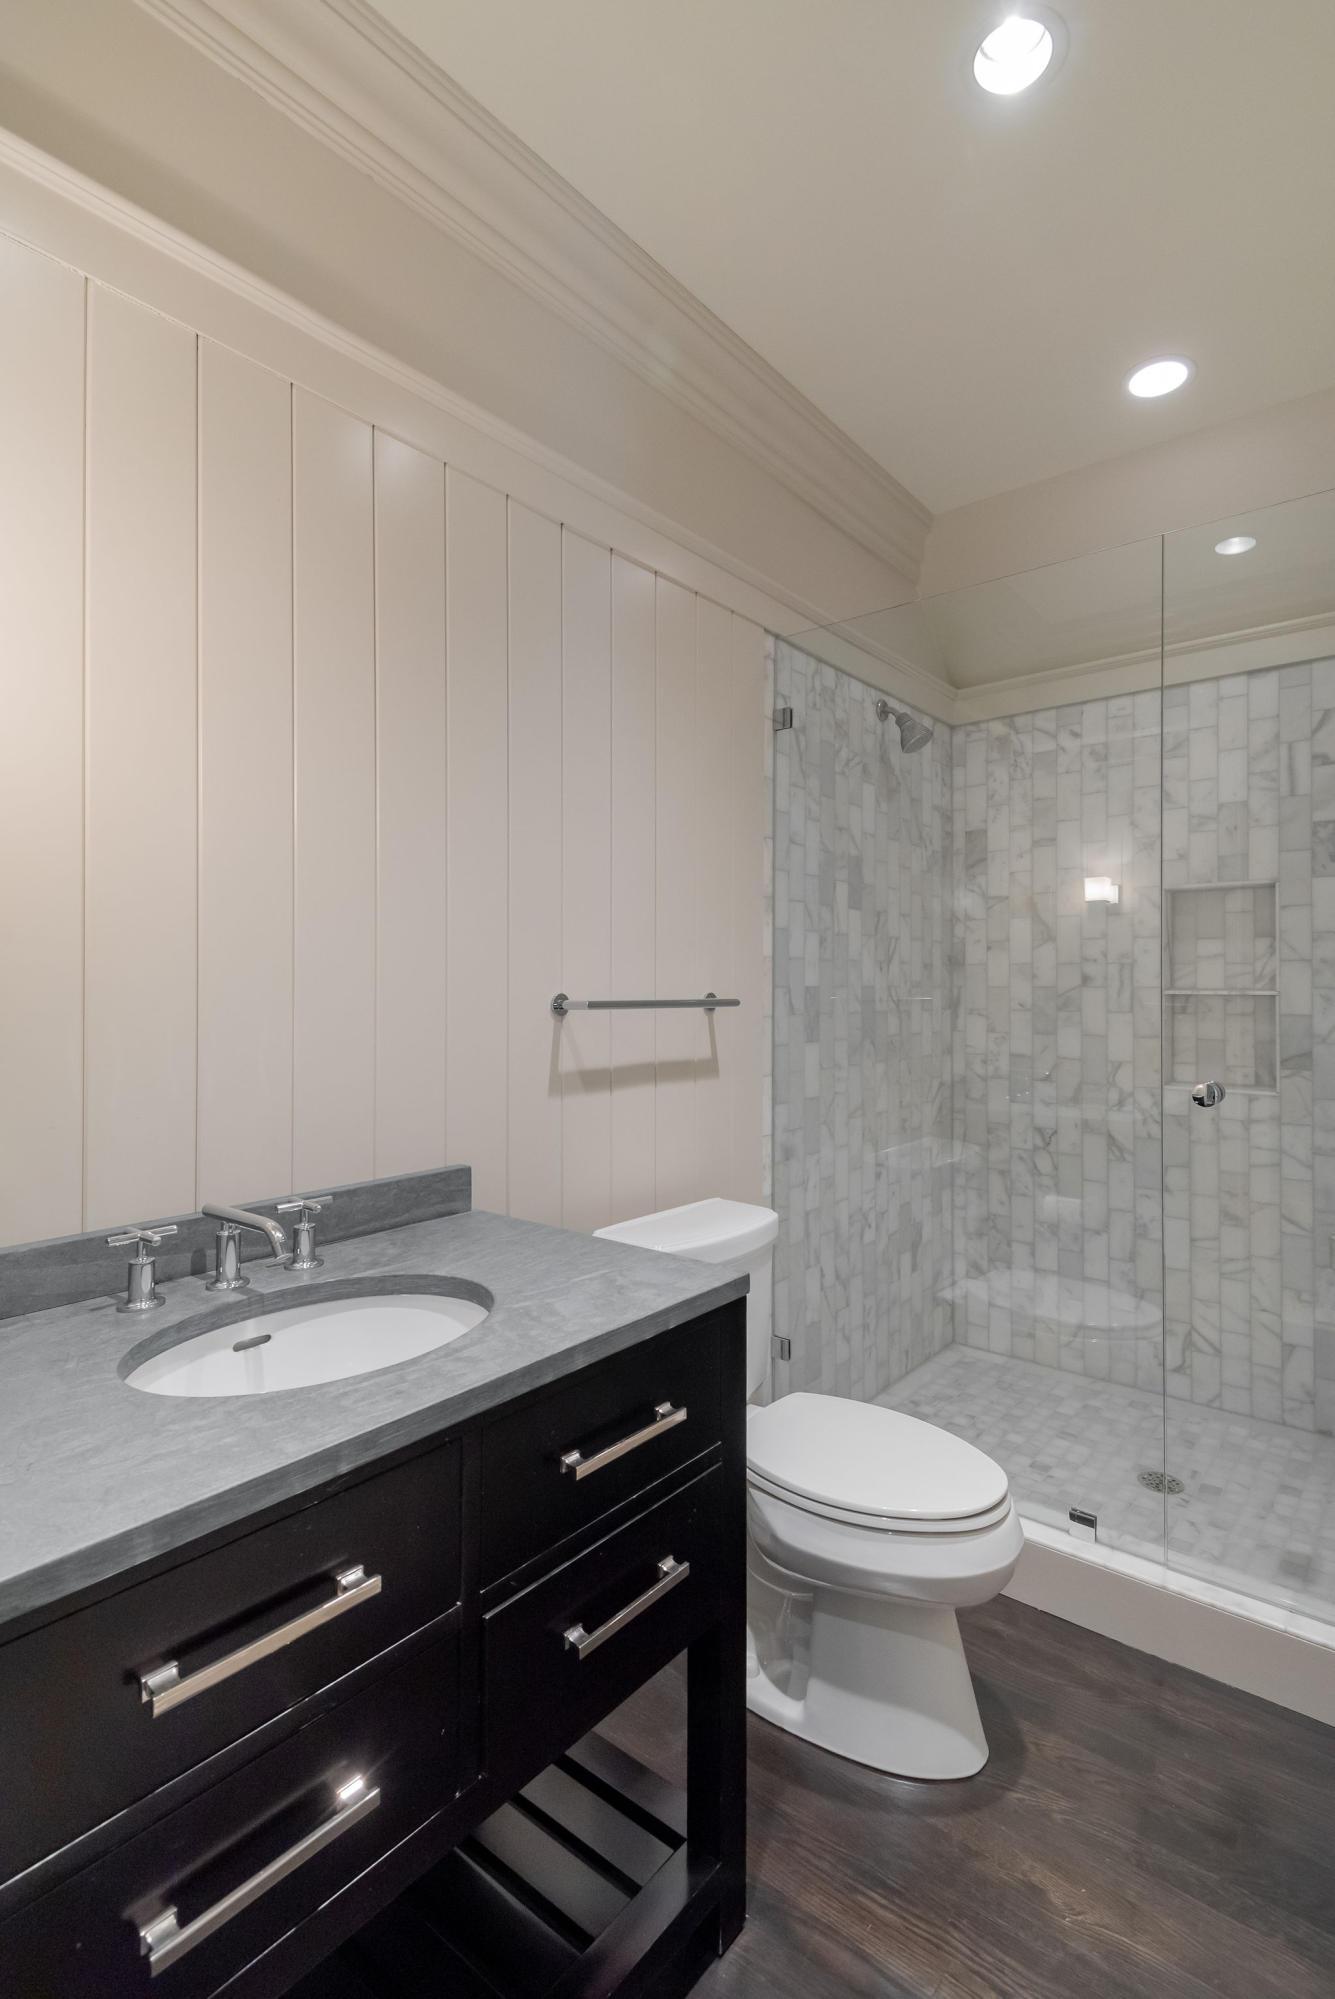 Kiawah Island Homes For Sale - 3 Grey Widgeon, Kiawah Island, SC - 13